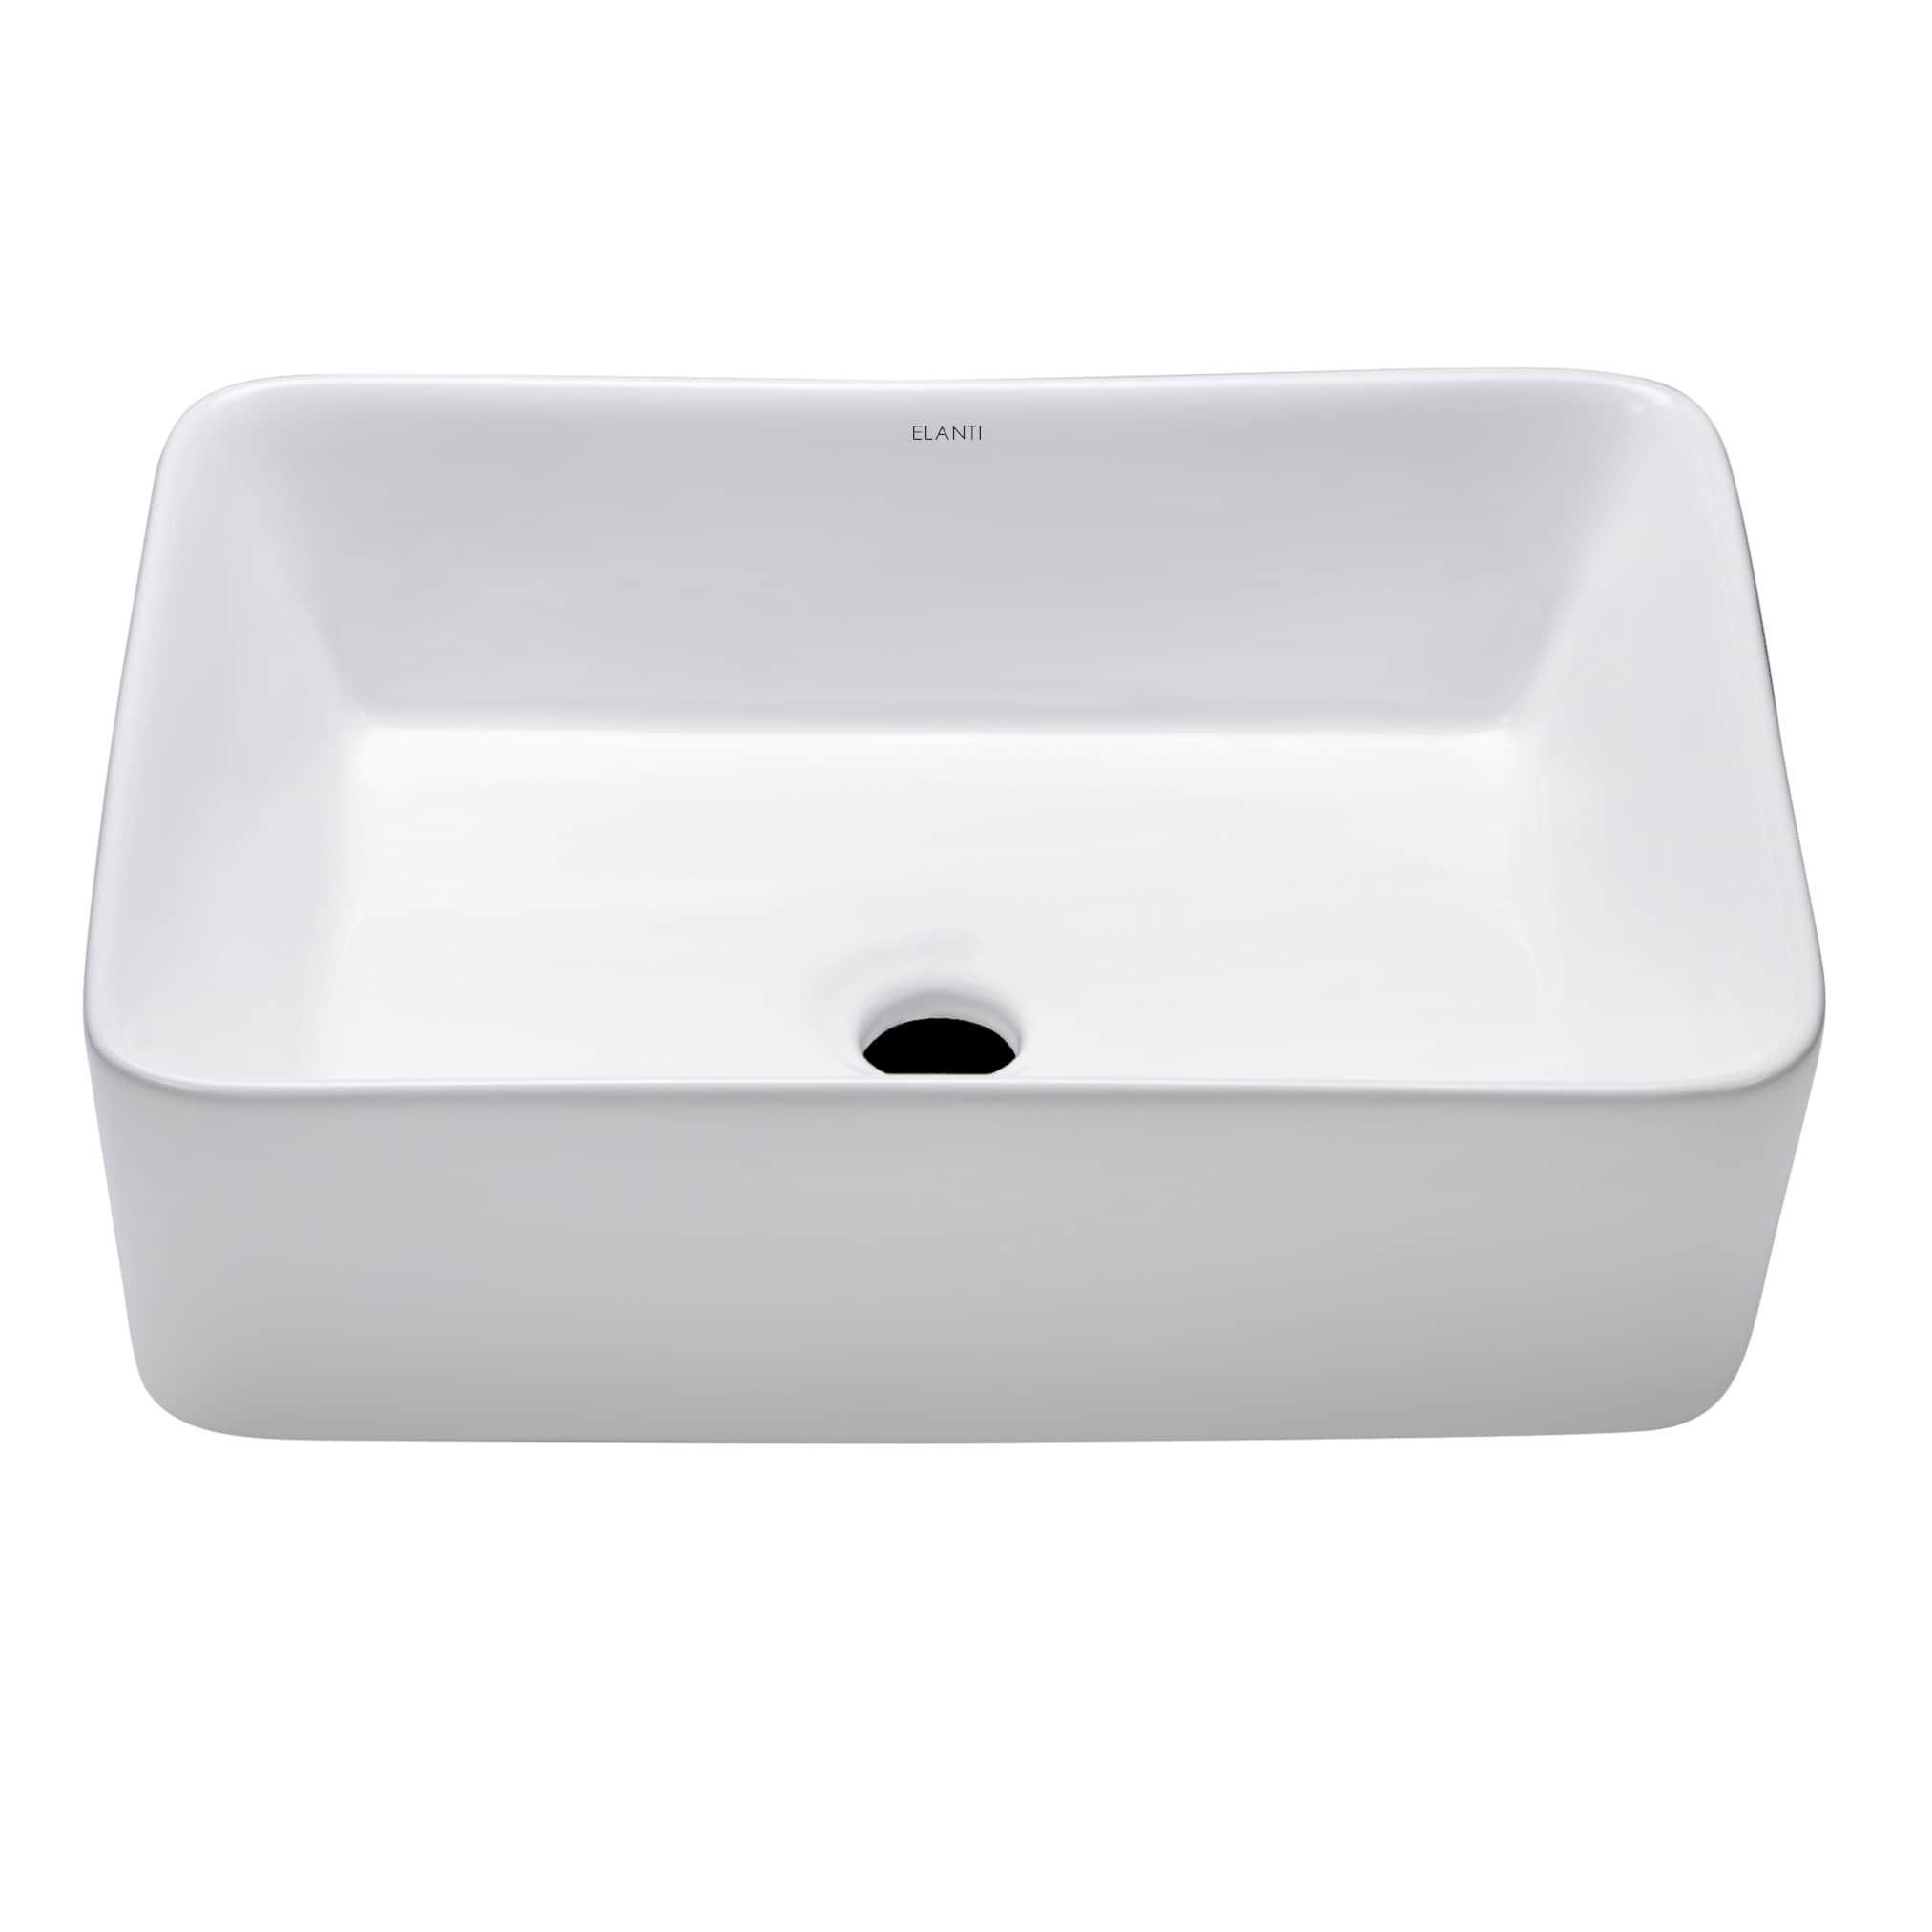 Elanti Collection 1606 Porcelain Tall Edge Deep Basin Rectangular Vessel  Sink In White (Porcelain